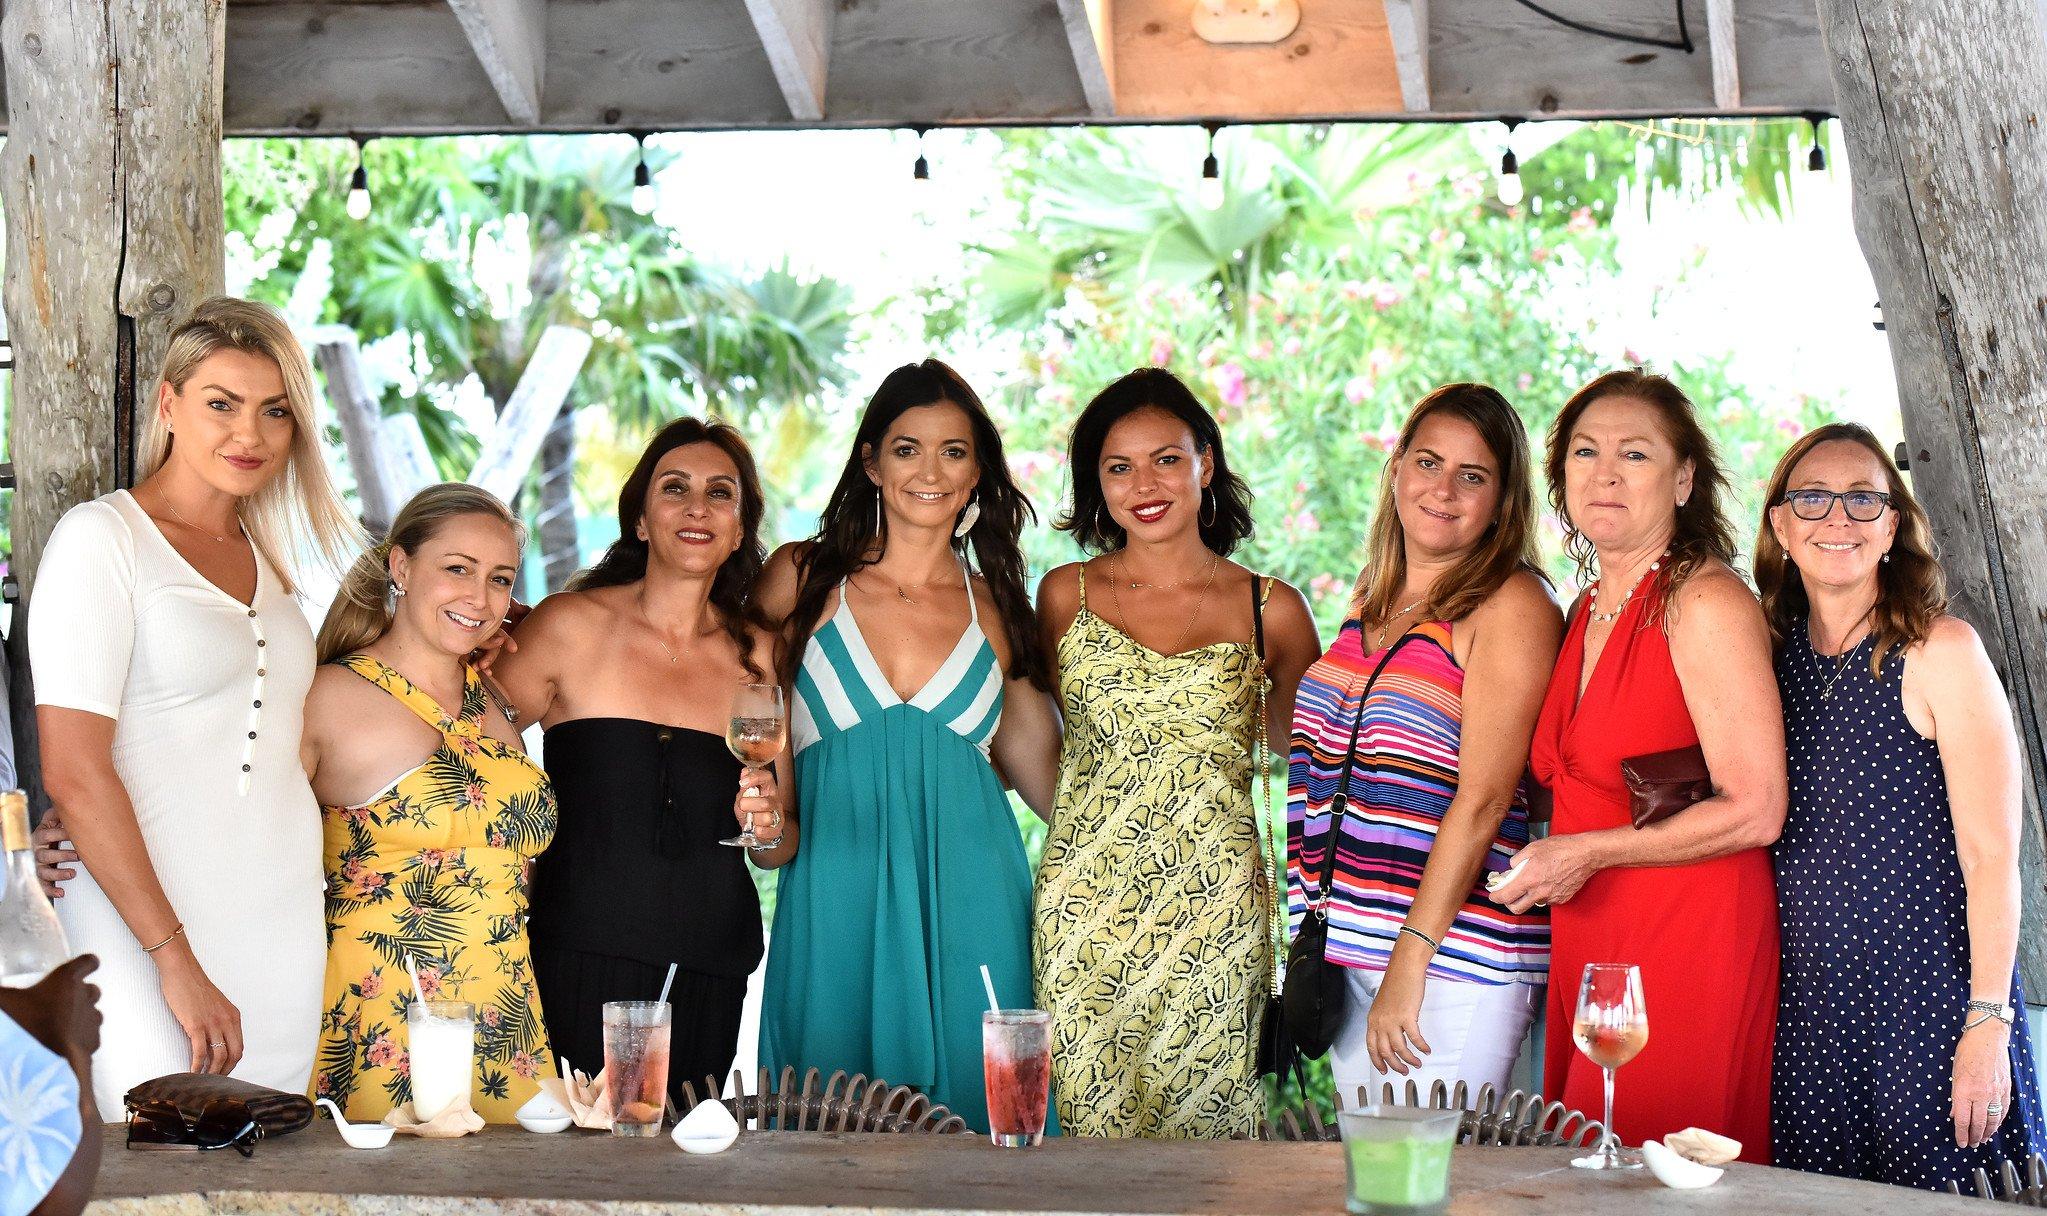 Bahamas is Choice Destination for Superyachts